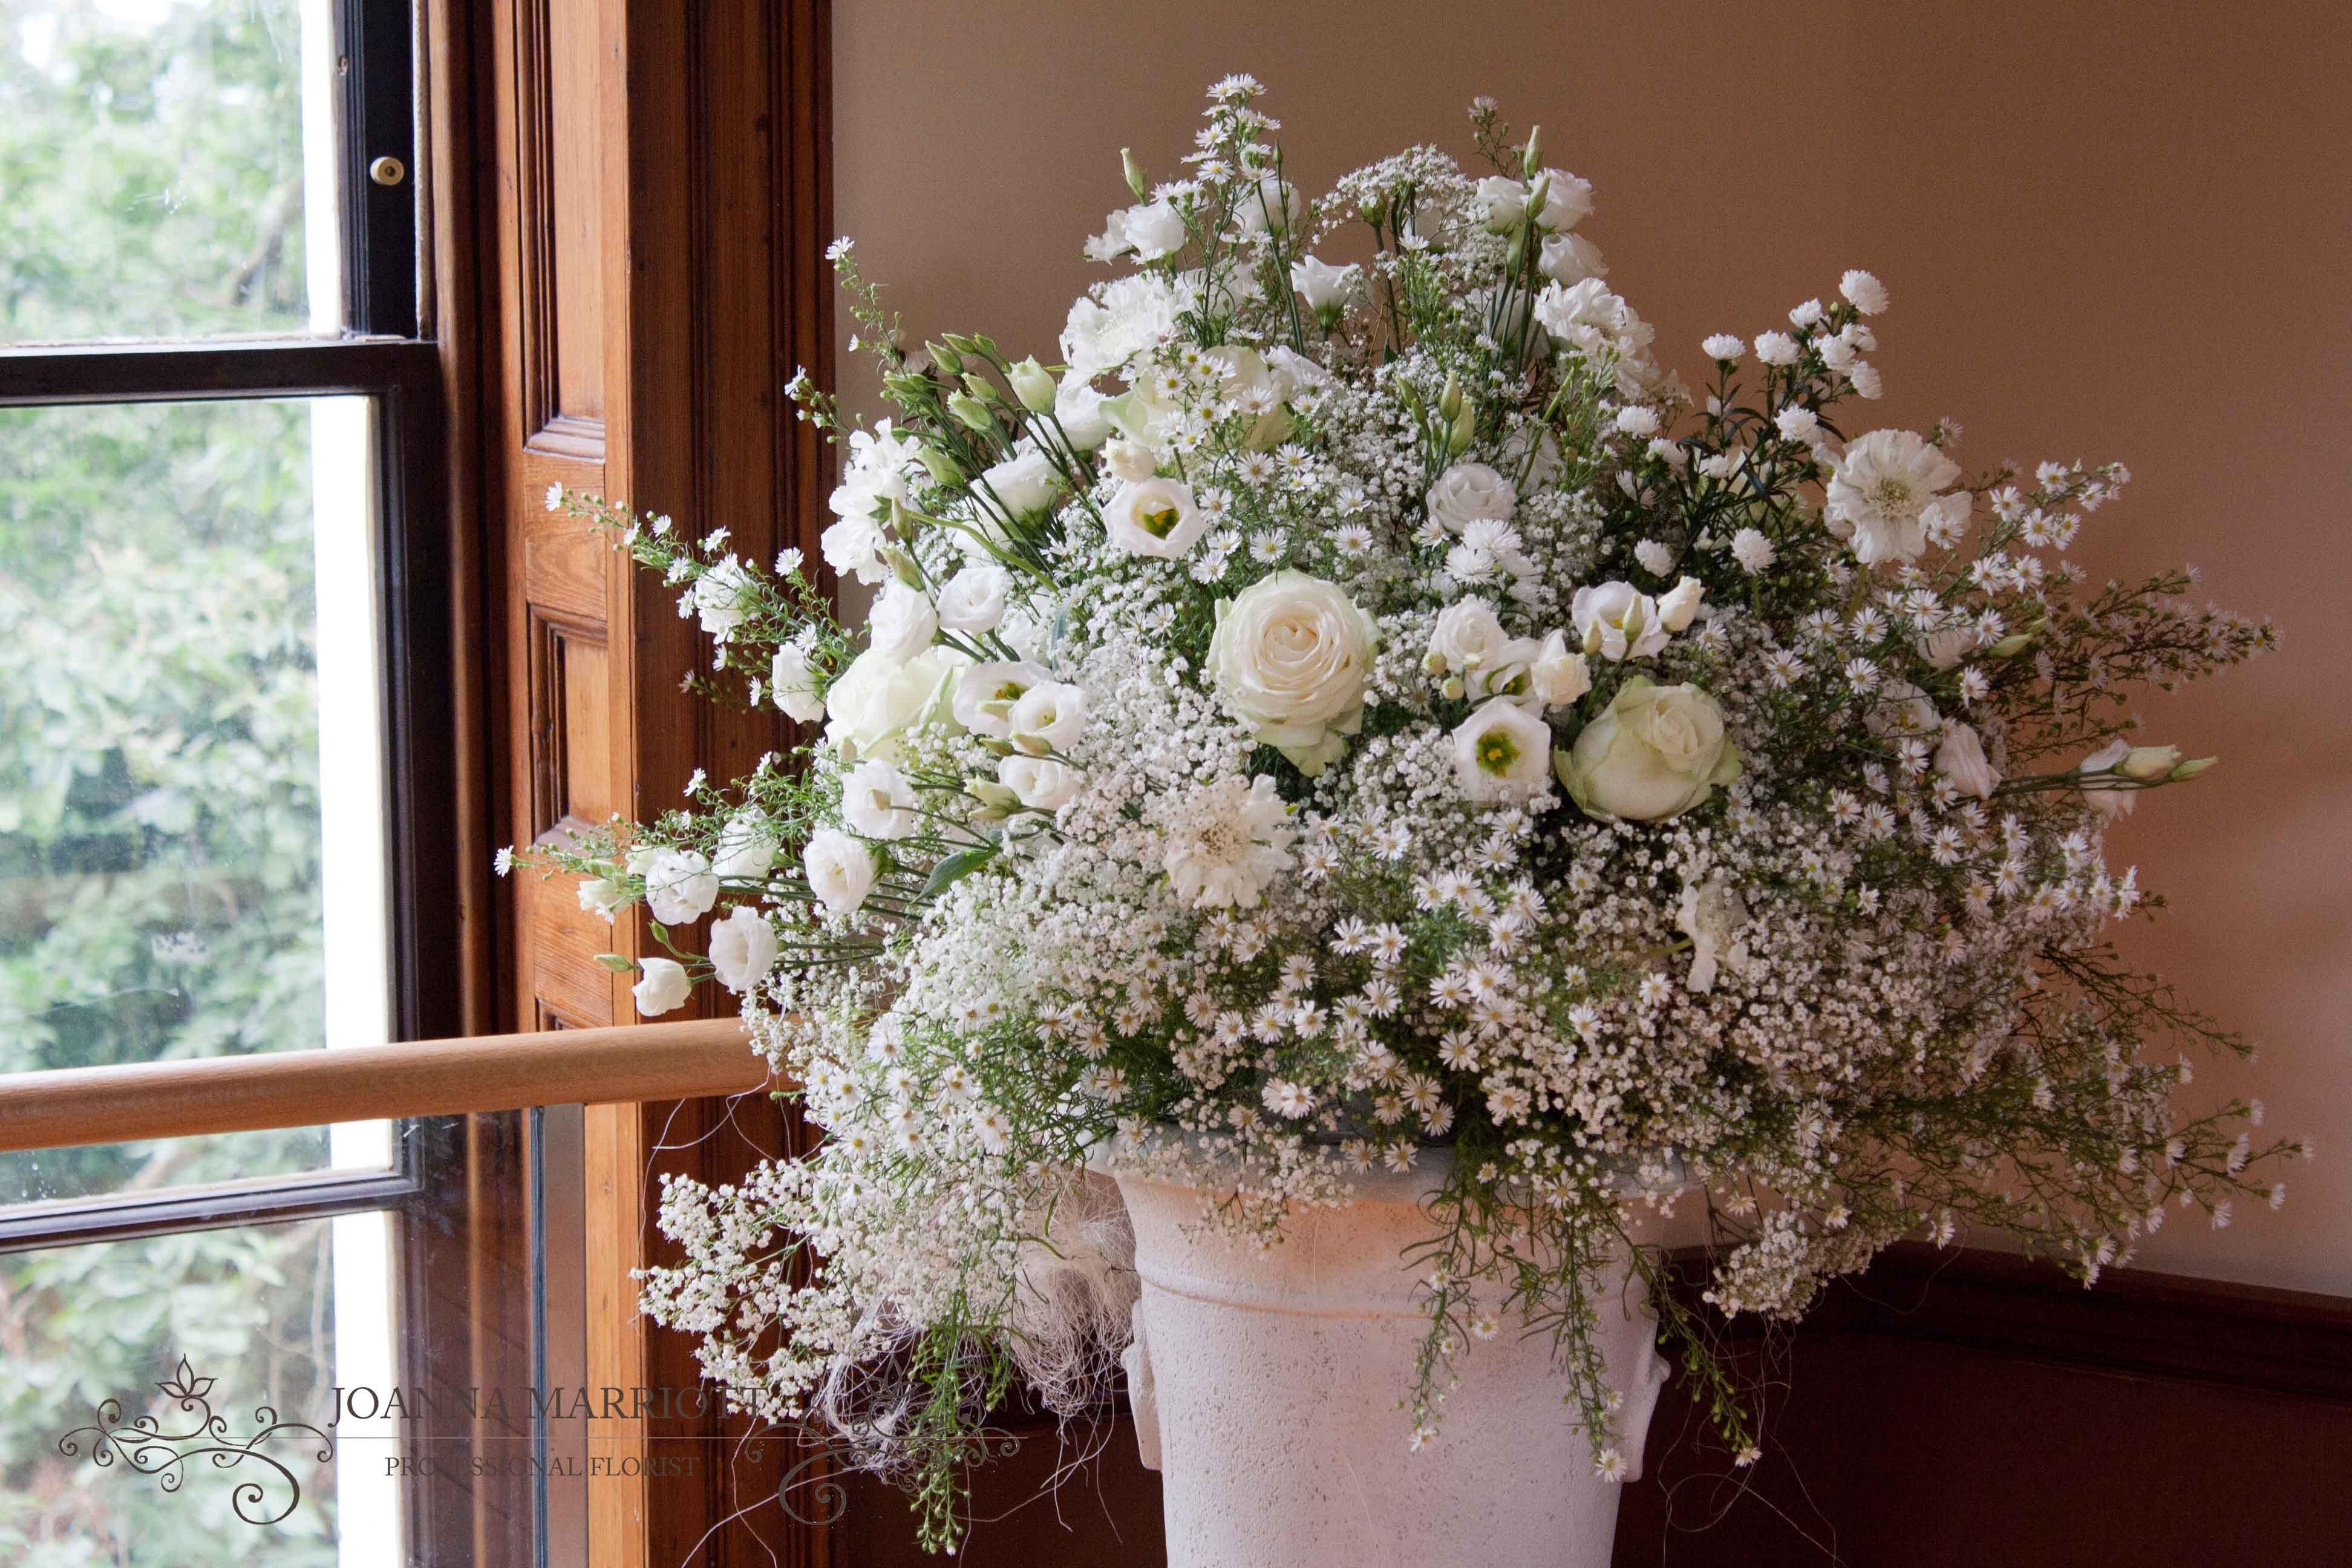 Delicate Wedding Pedestal Arrangement White Gypsophila Asters Roses Lisianthus Scabious Wedding Flowers Gypsophila White Roses